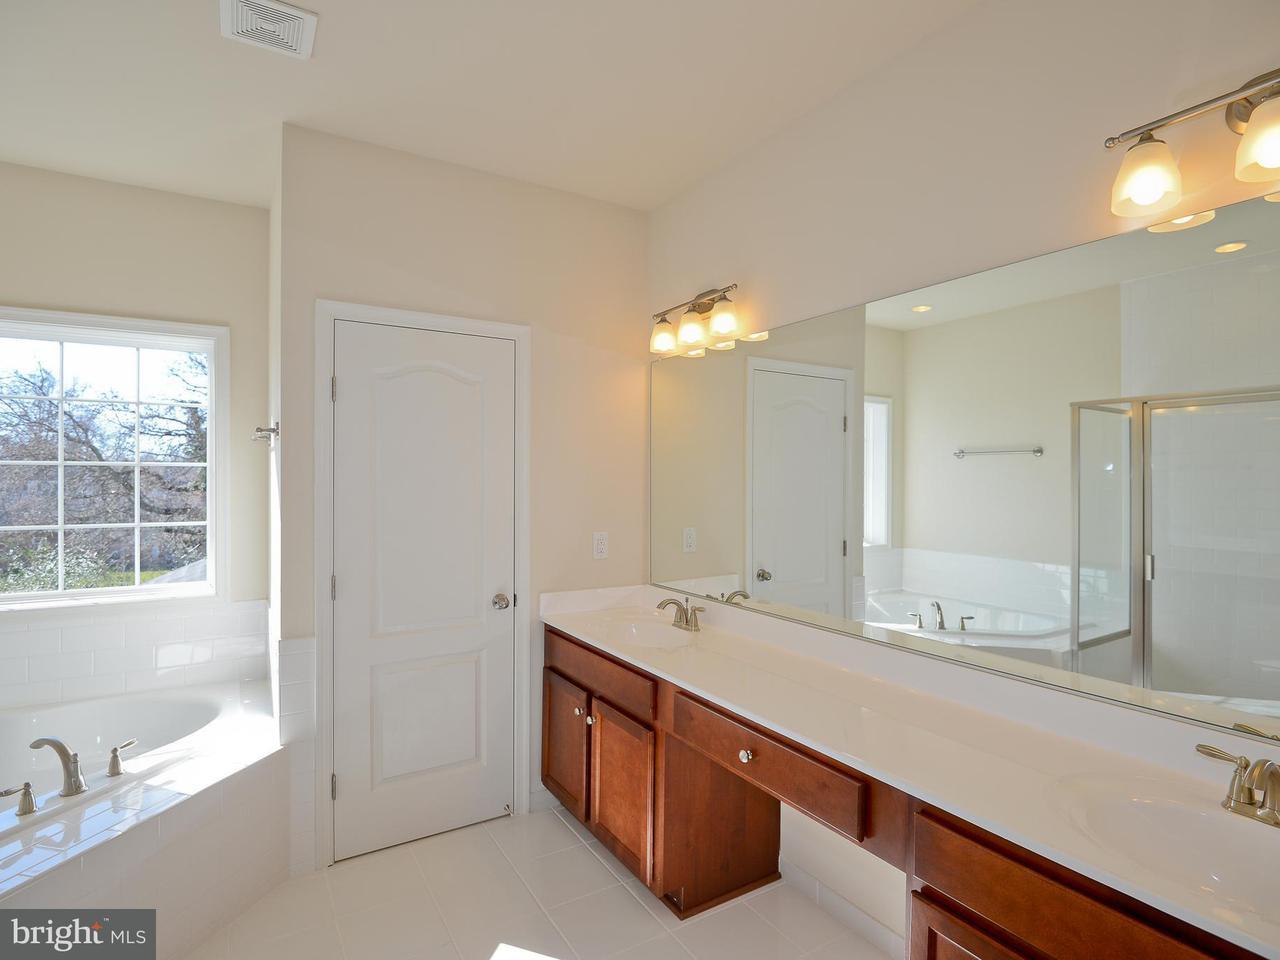 Additional photo for property listing at 9038 SUDLEY RD #15A 9038 SUDLEY RD #15A Manassas, Виргиния 20110 Соединенные Штаты